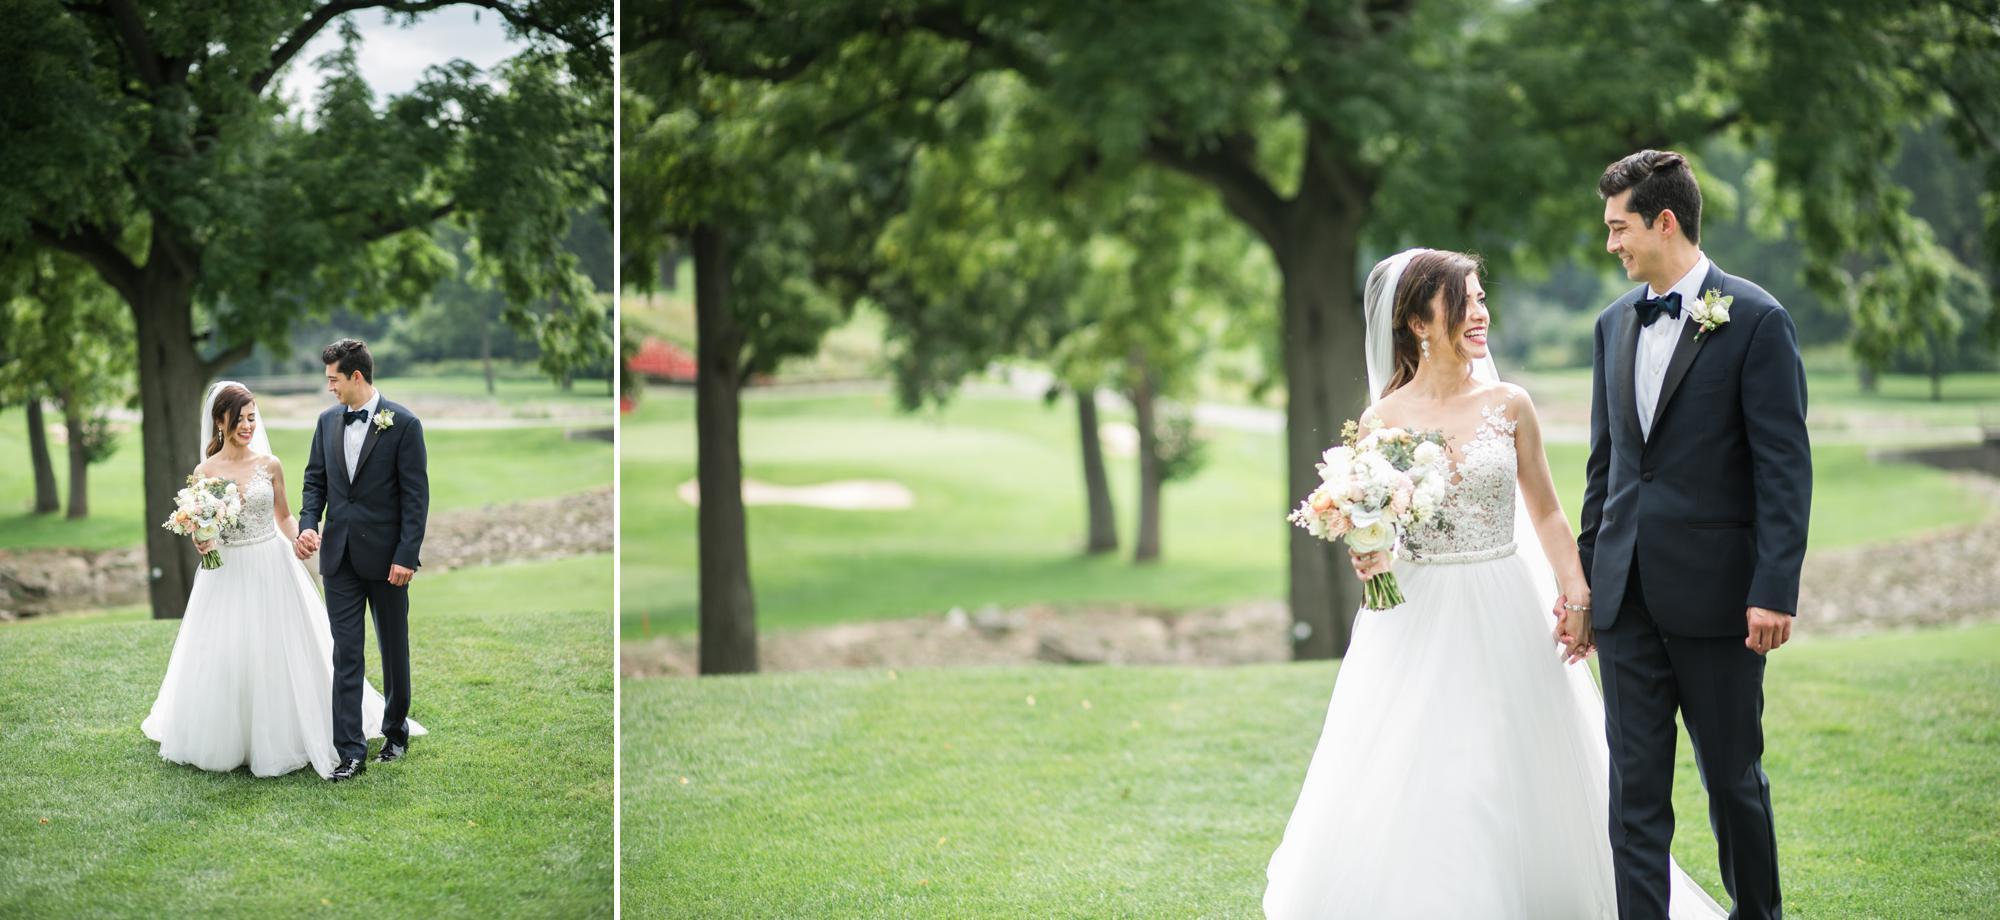 sylvania-country-club-wedding-photos-212.jpg